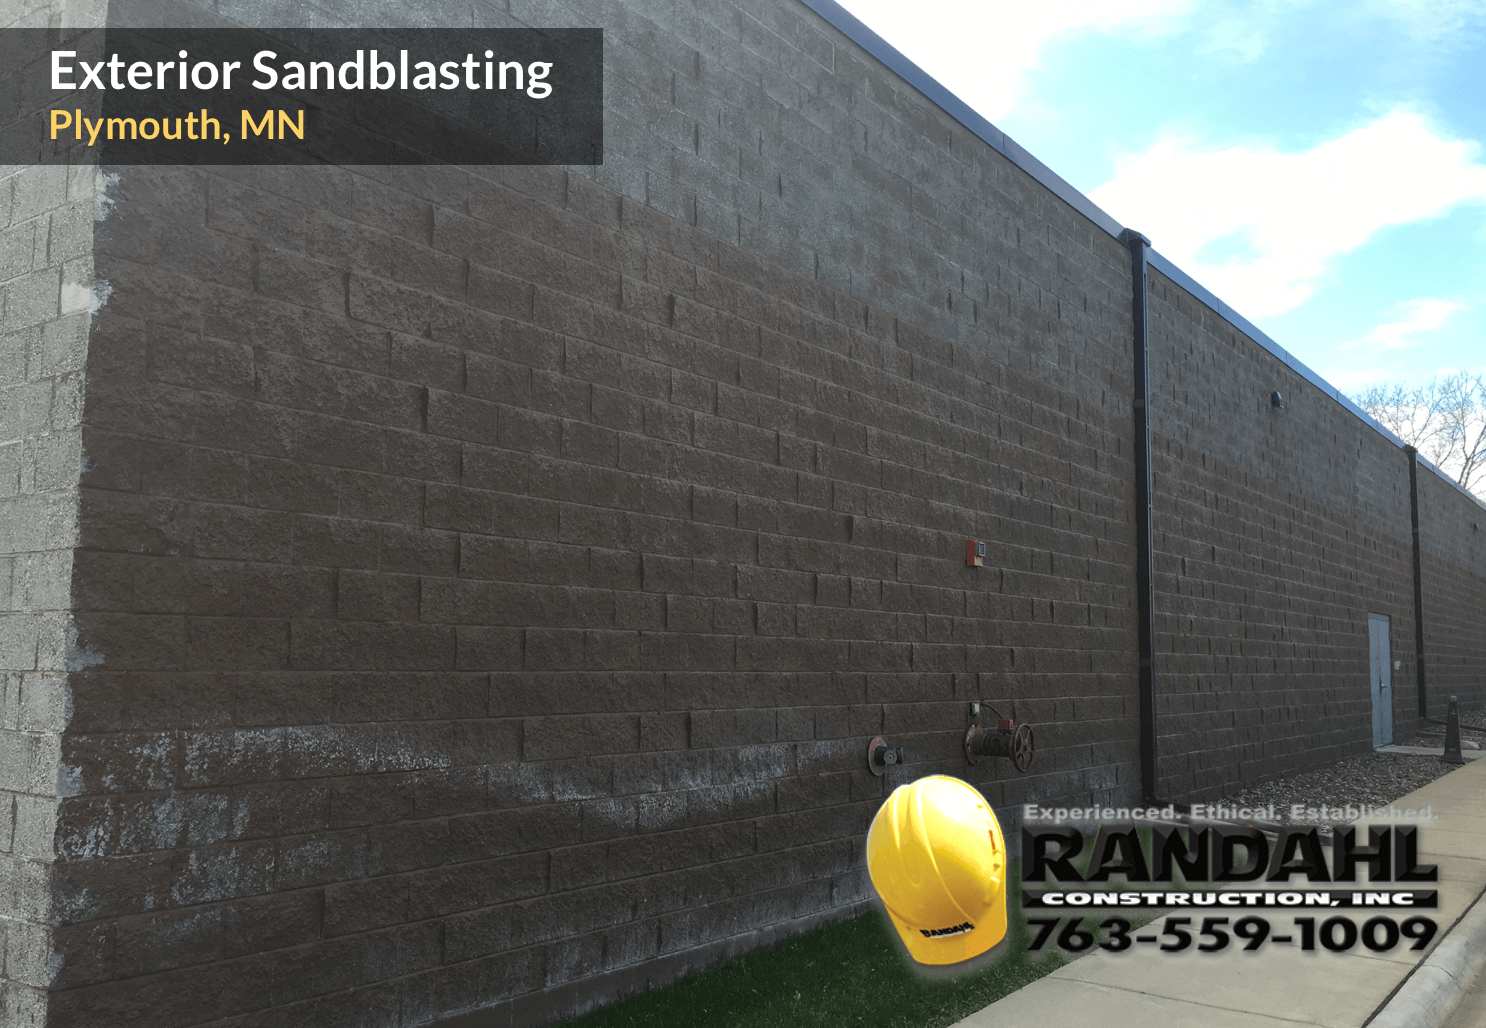 mn exterior sandblast contractor